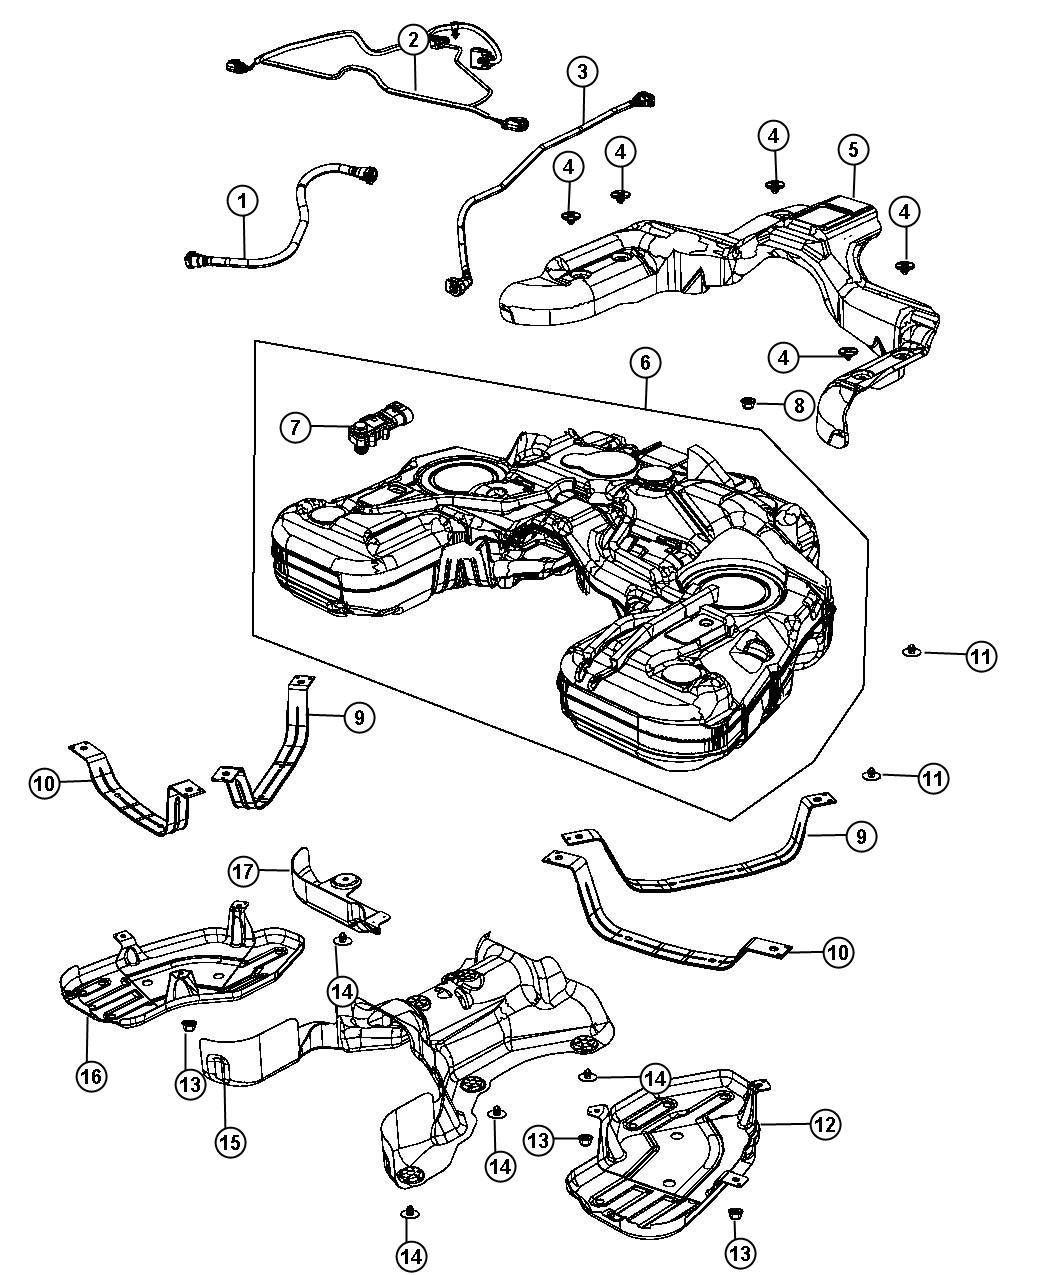 Dodge Durango Wiring Fuel Tank Jumper Nf4 Nf4